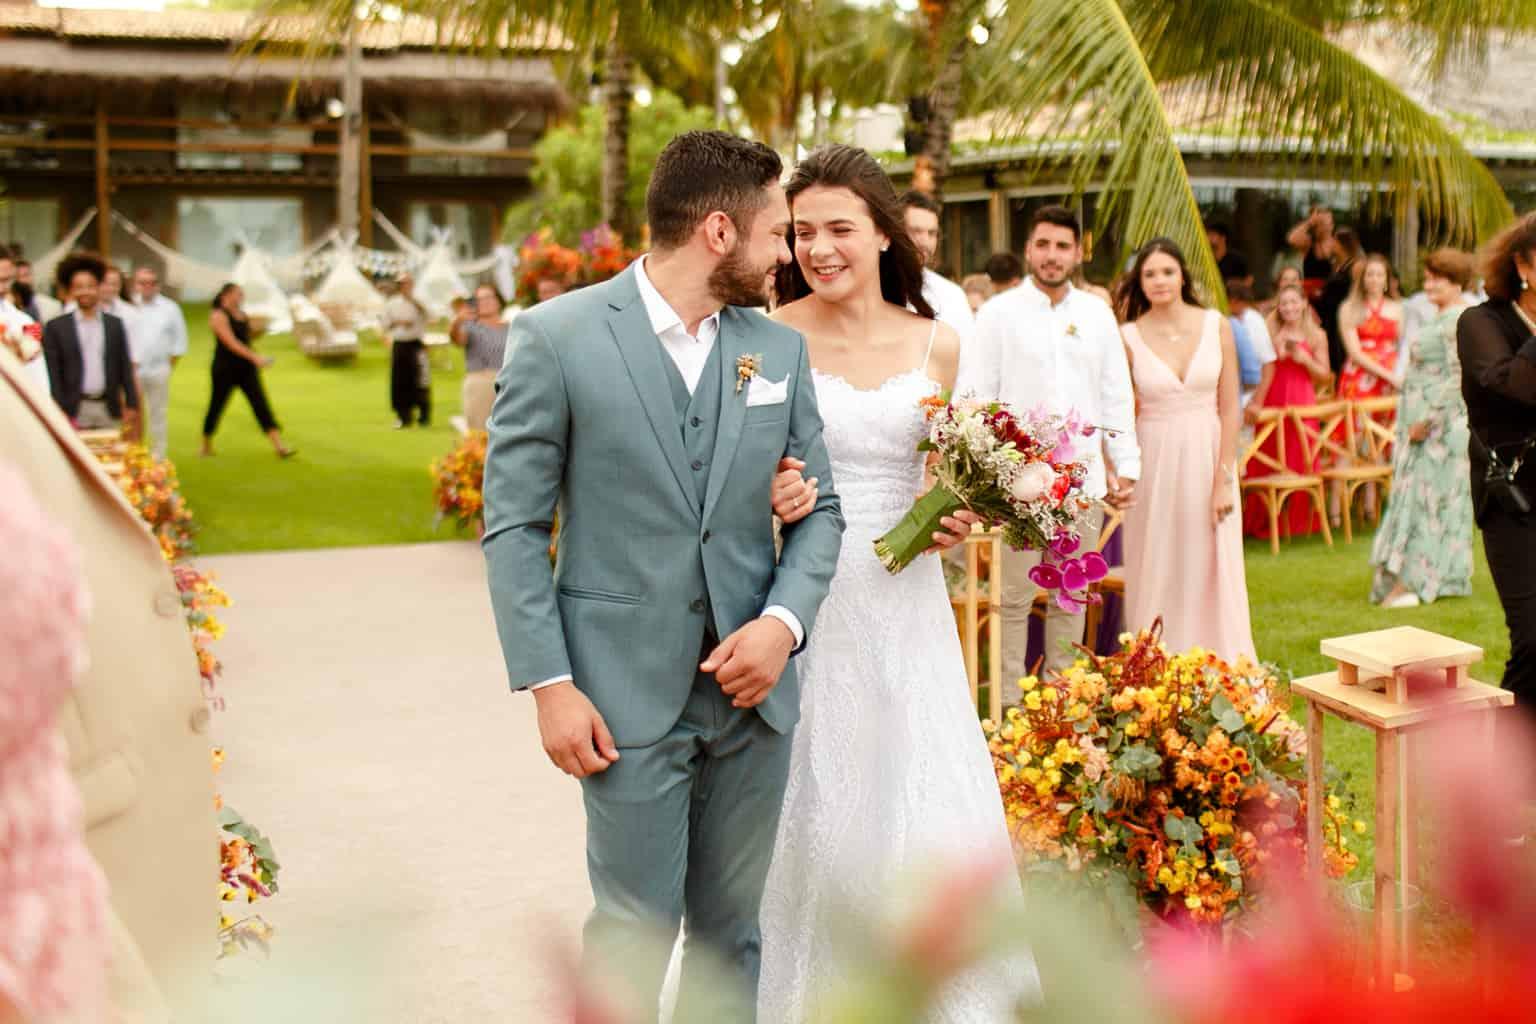 Casamento-Emanuelle-e-Alysson-Fotografia-Tadeu-Nanó-e-Luca-Antunes80-1